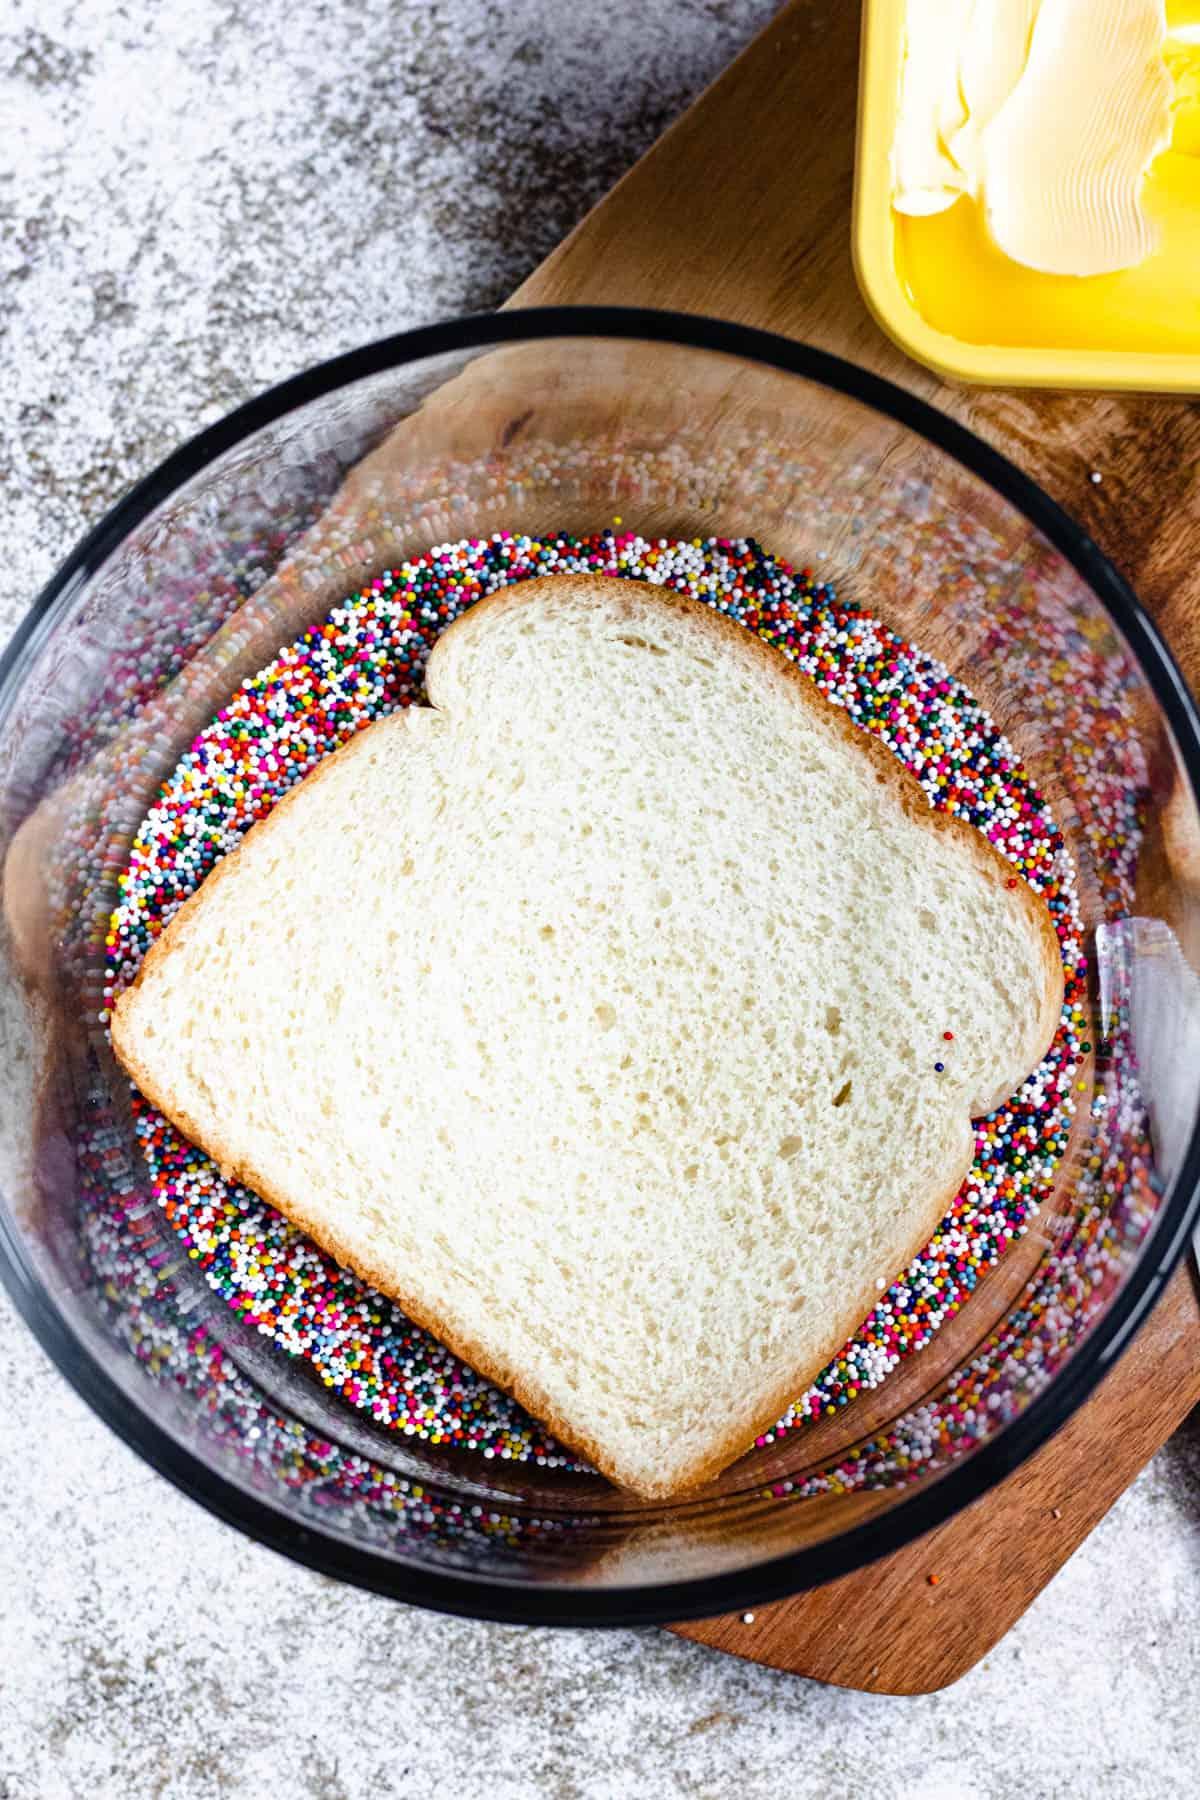 Bread in a bowl of sprinkles